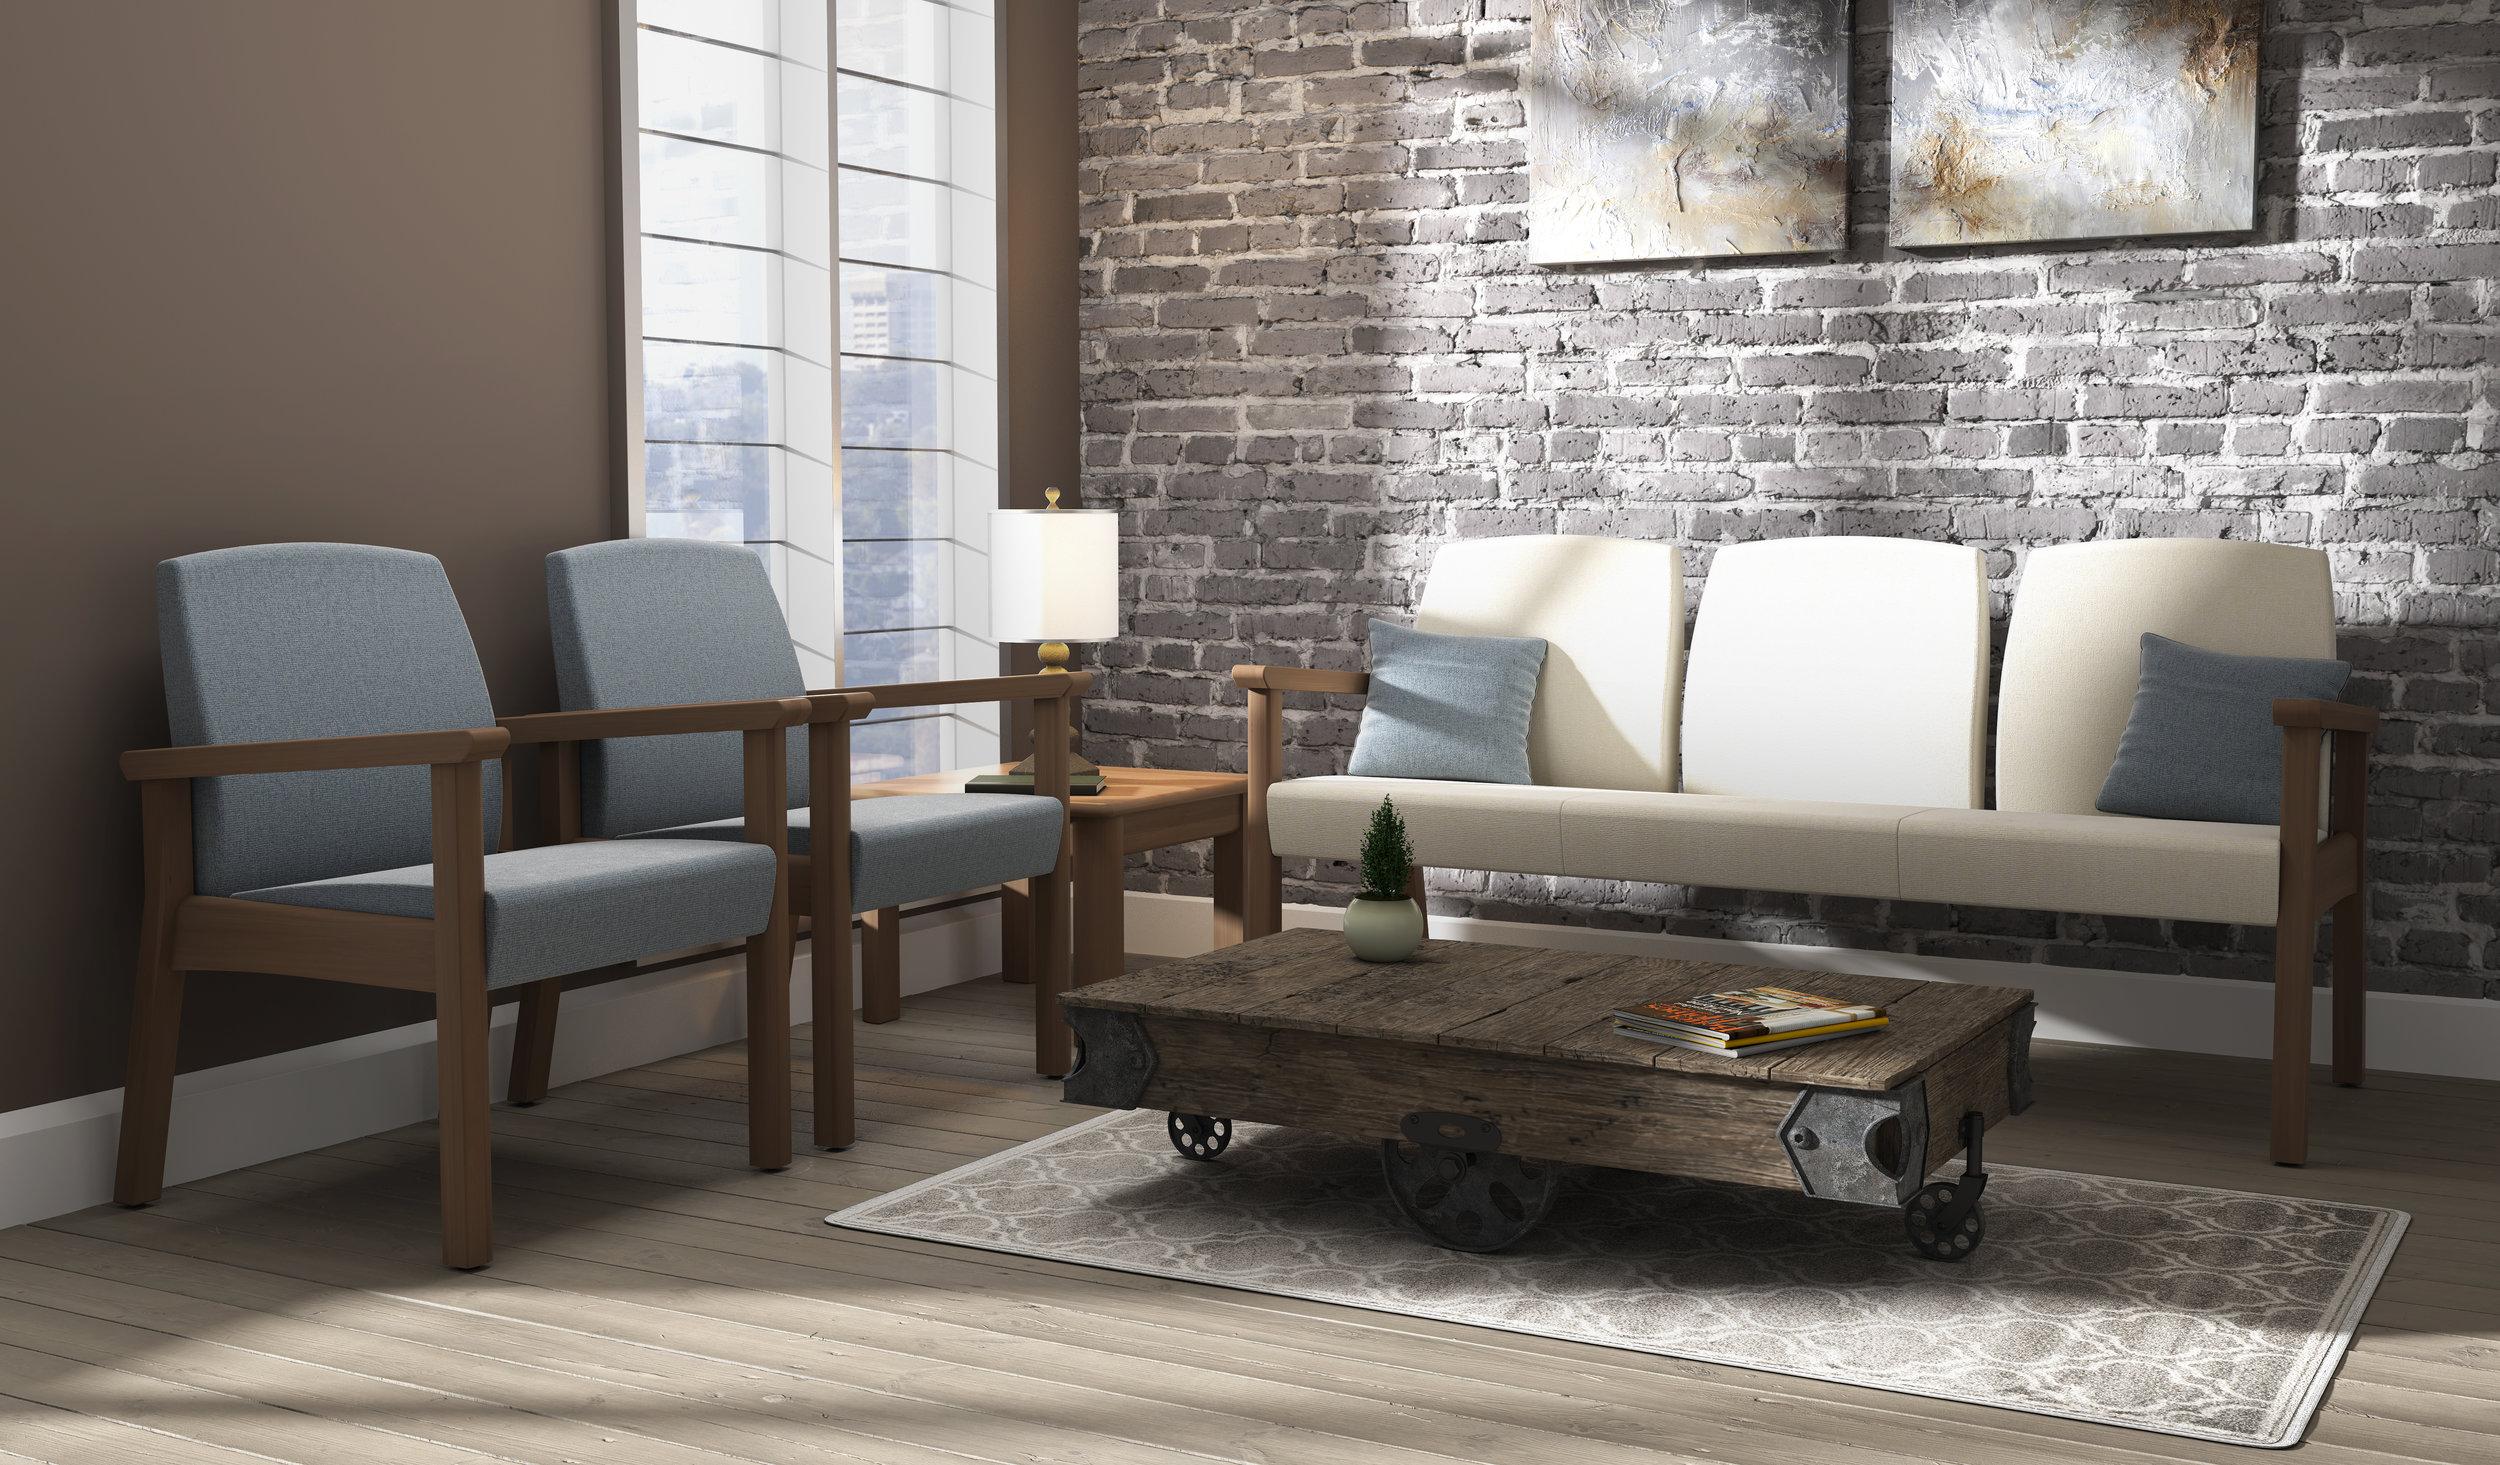 Stance boardwalk wood Seating.jpg